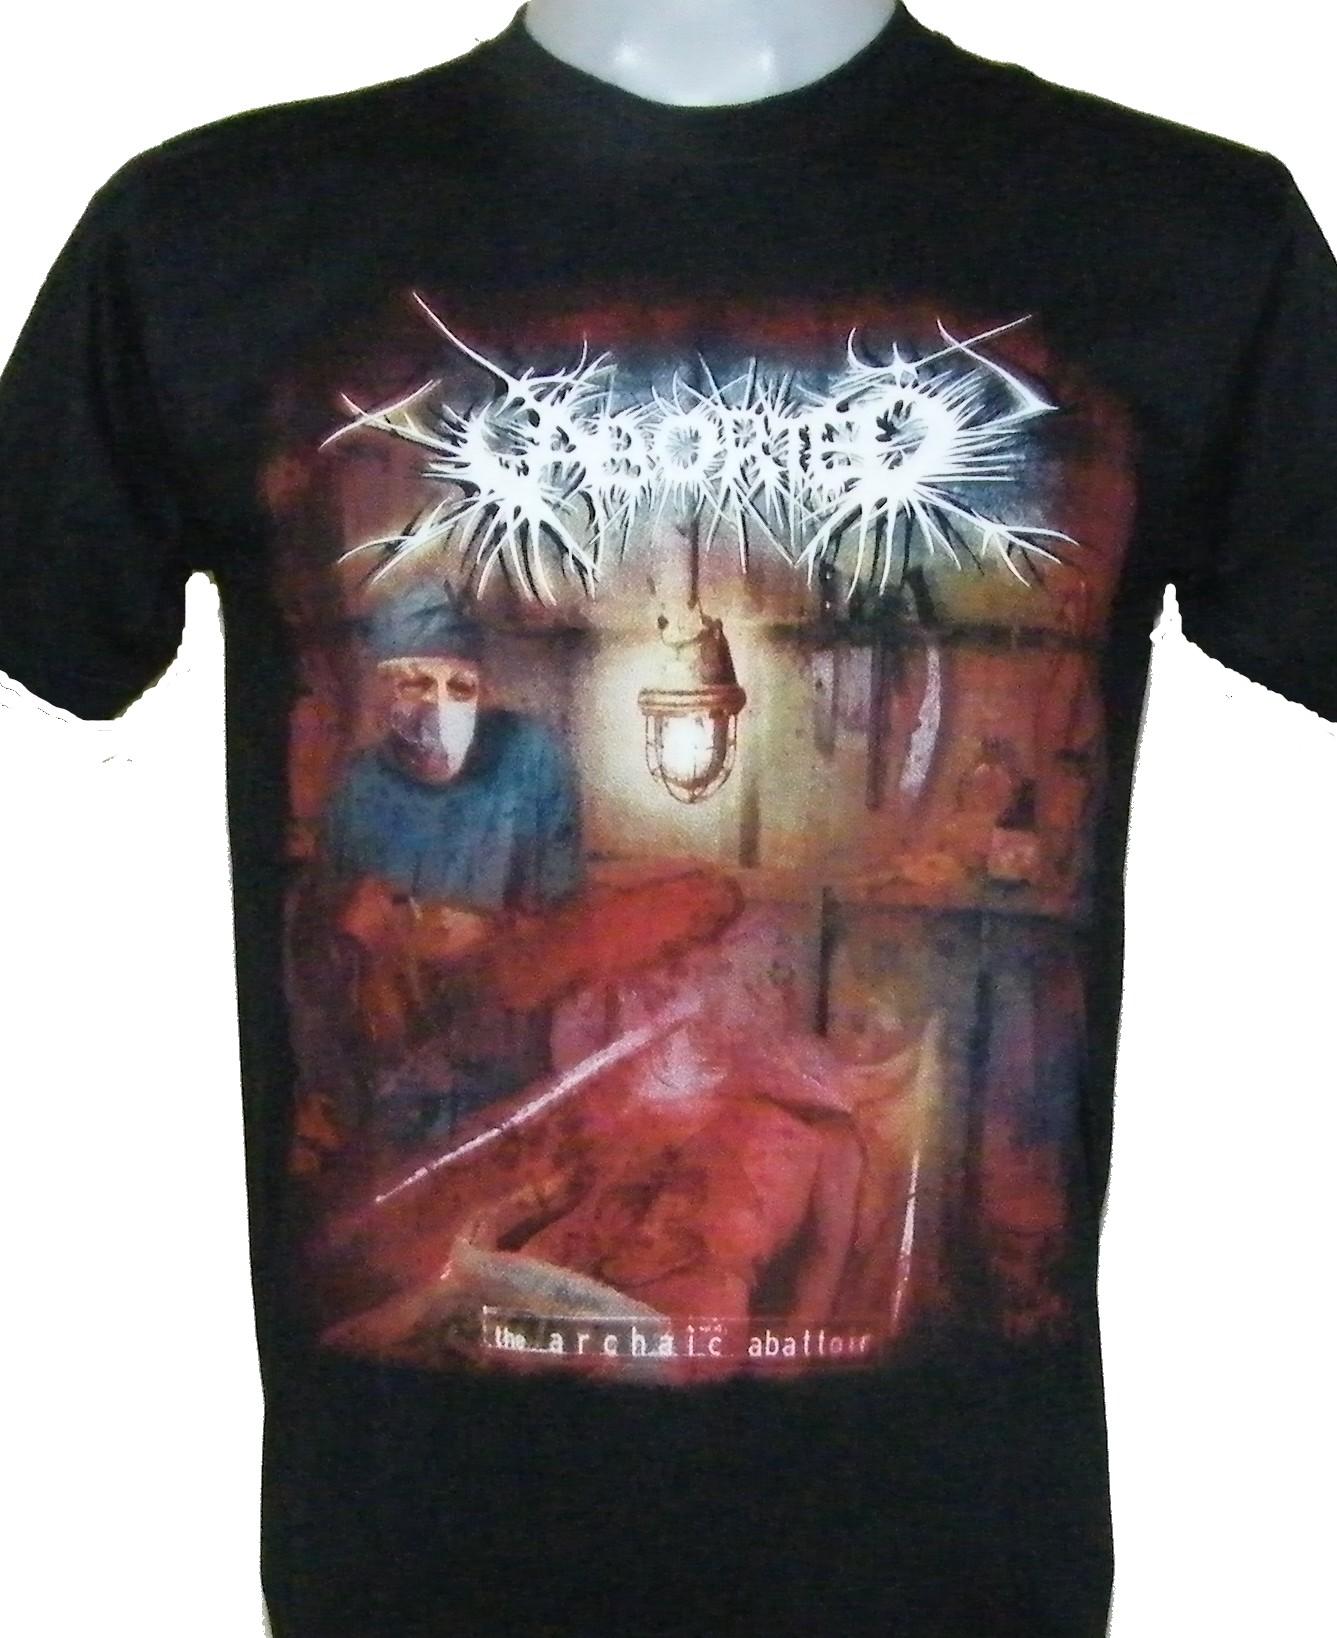 69af8ed8f Aborted t-shirt The Archaic Abattoir size M